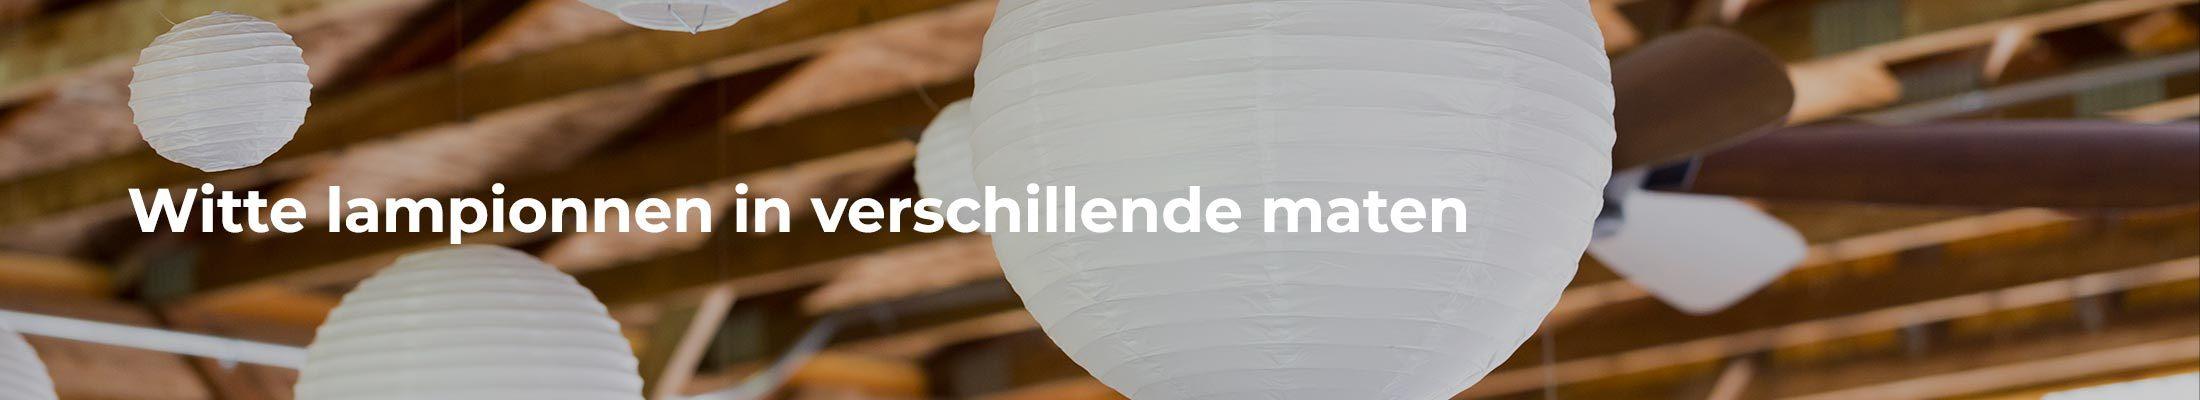 Witte lampionnen kopen